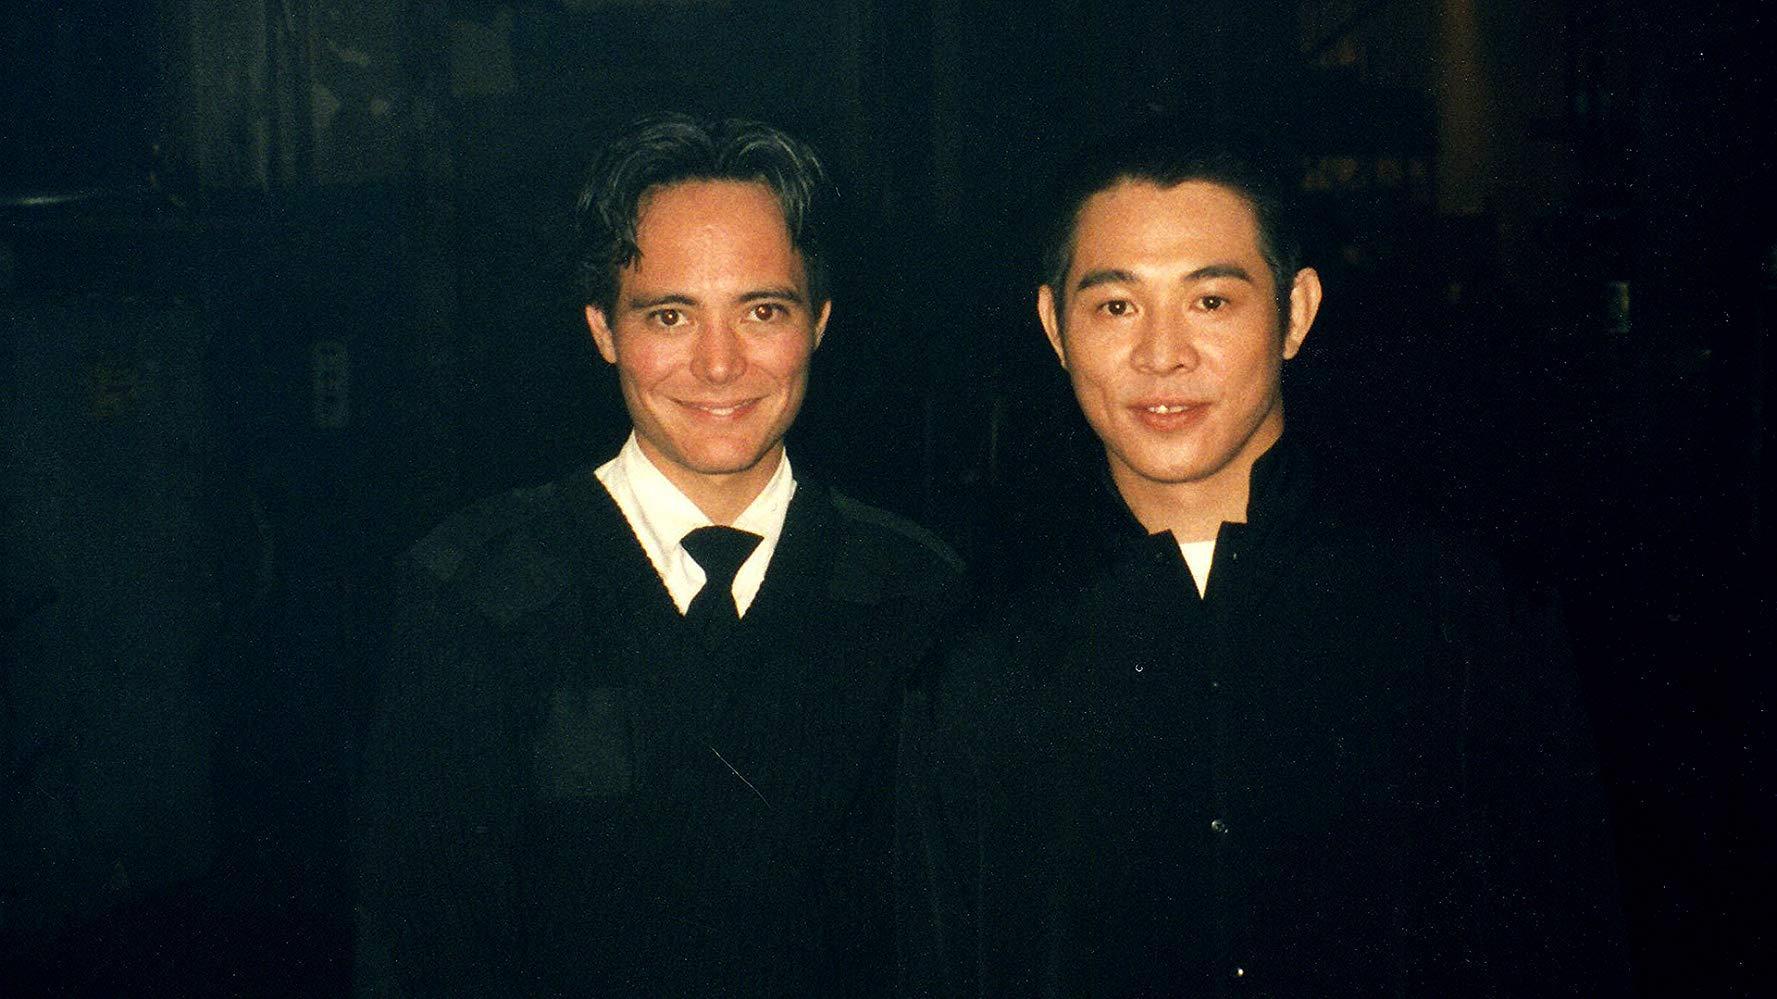 مشاهدة فيلم Lethal Weapon 4 1998 HD مترجم كامل اون لاين